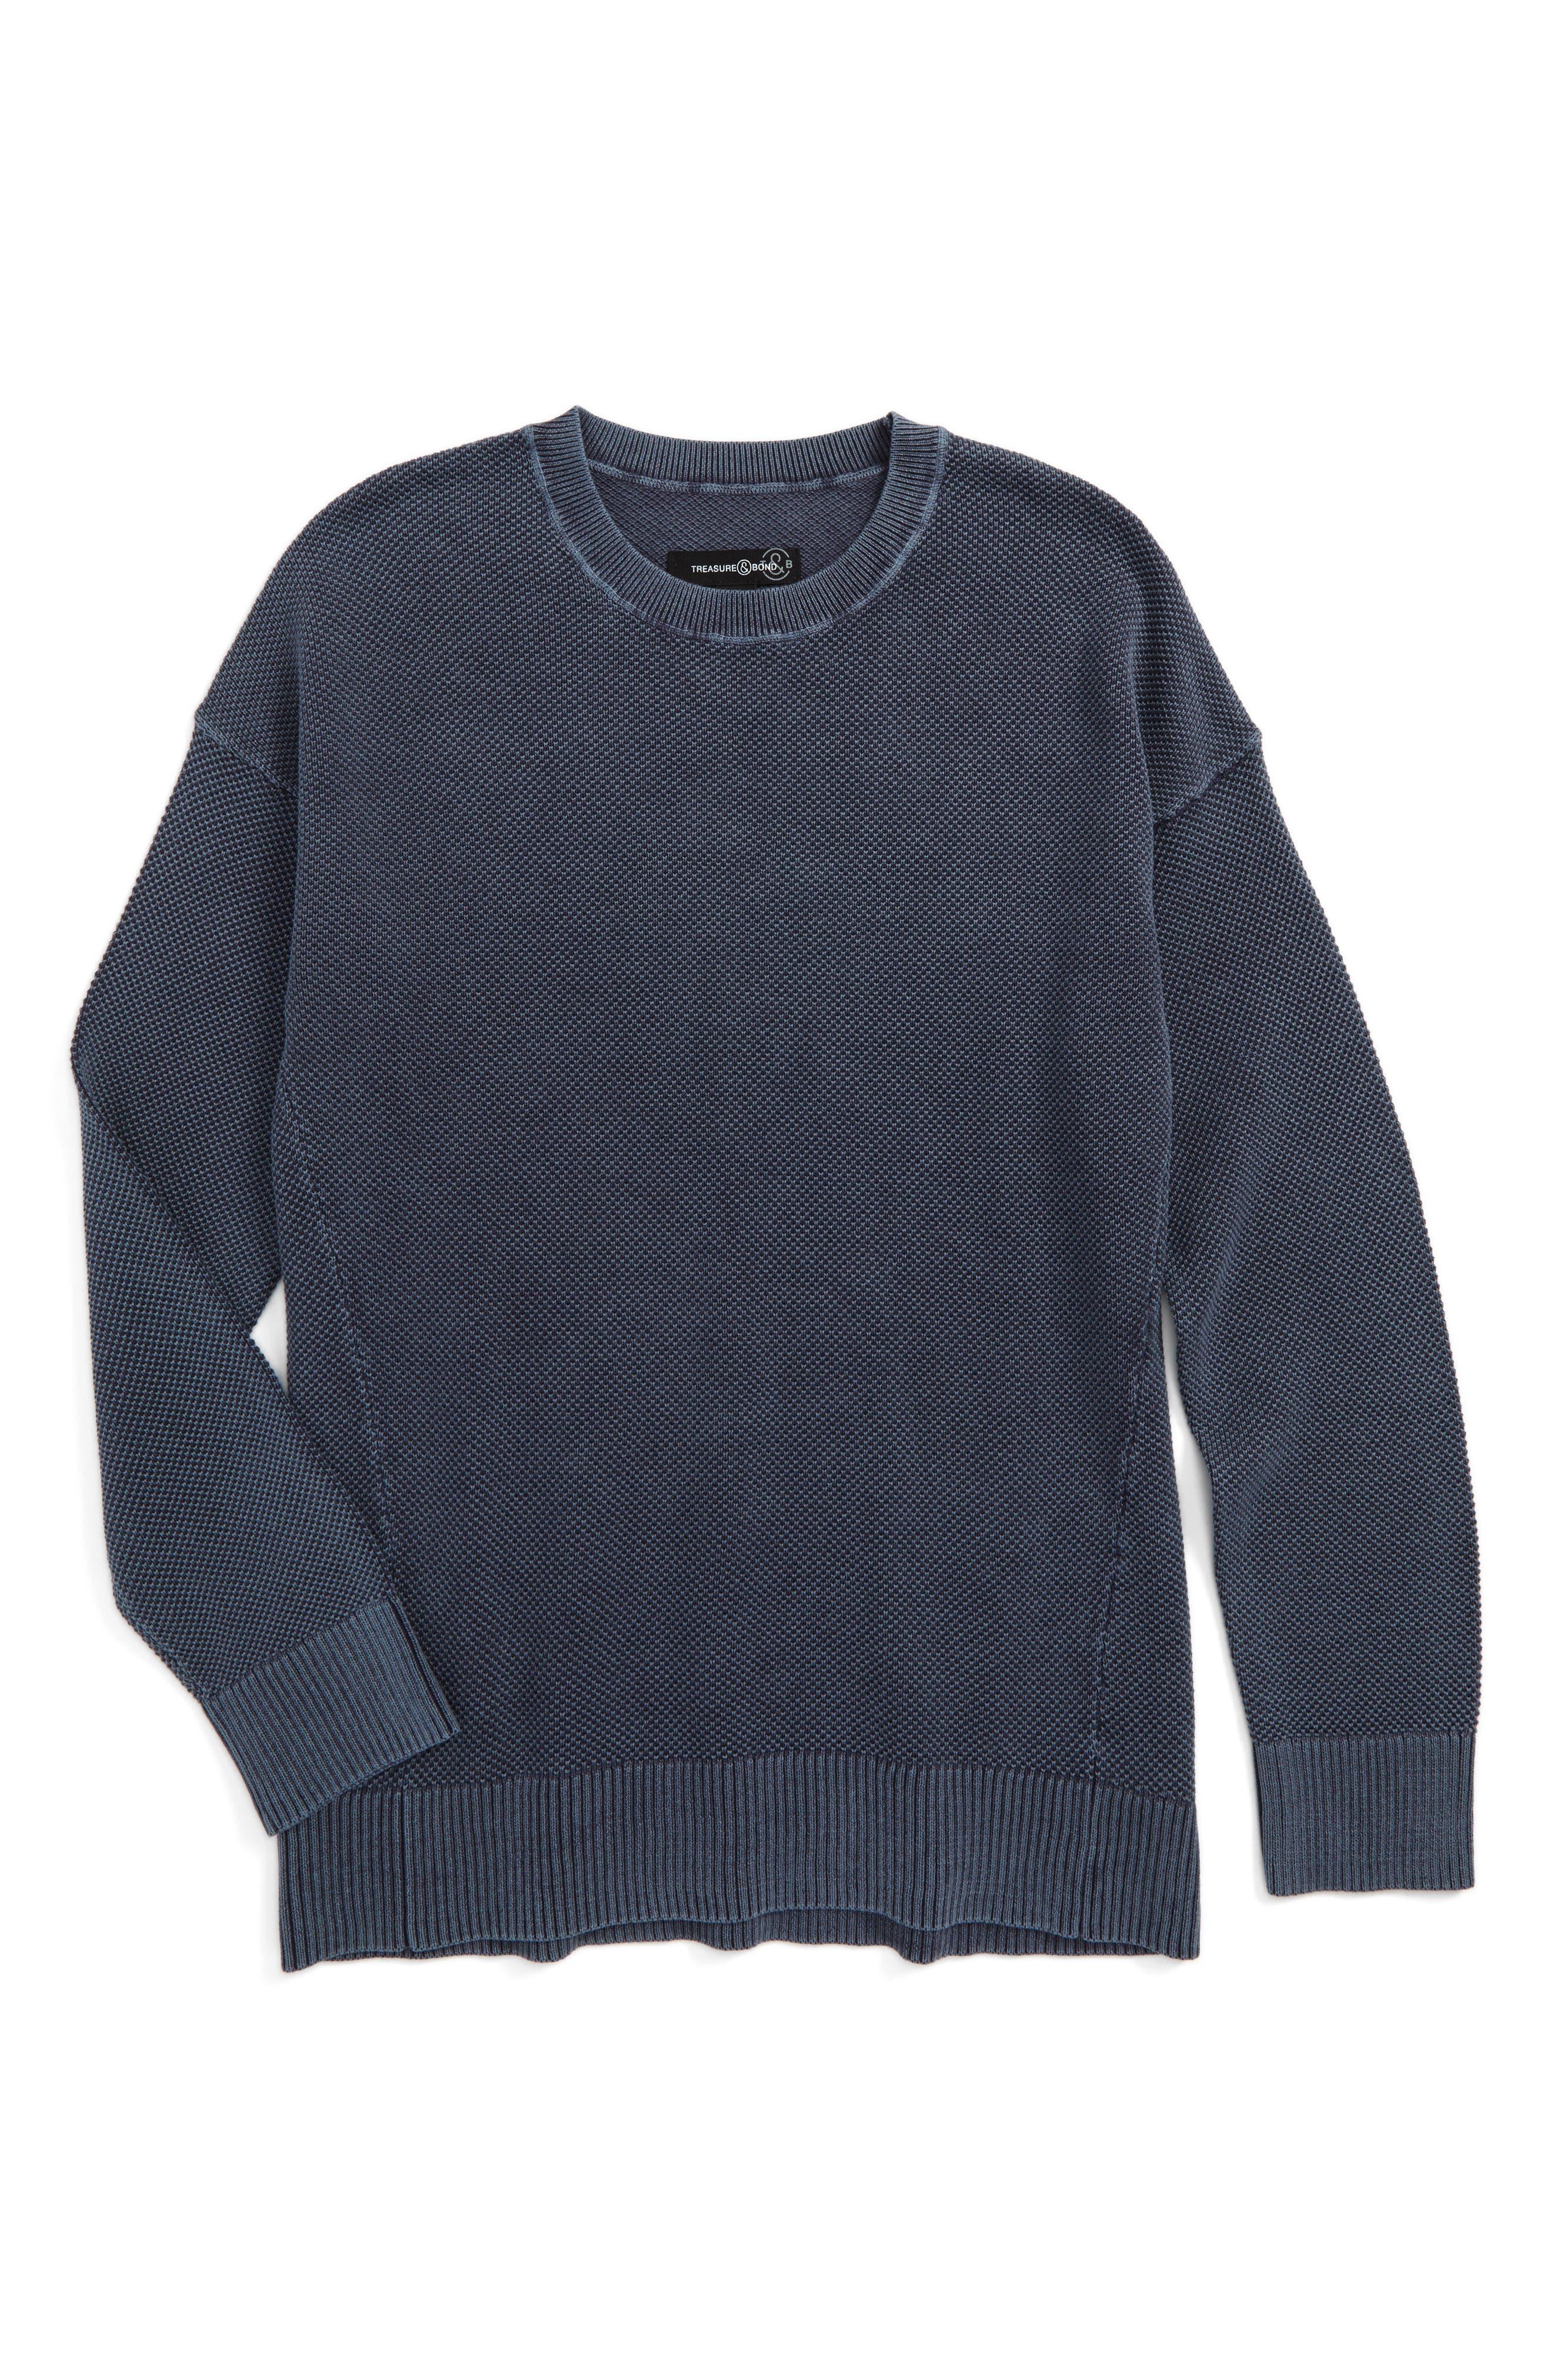 Alternate Image 1 Selected - Treasure & Bond Waffle Knit Sweater (Big Boys)